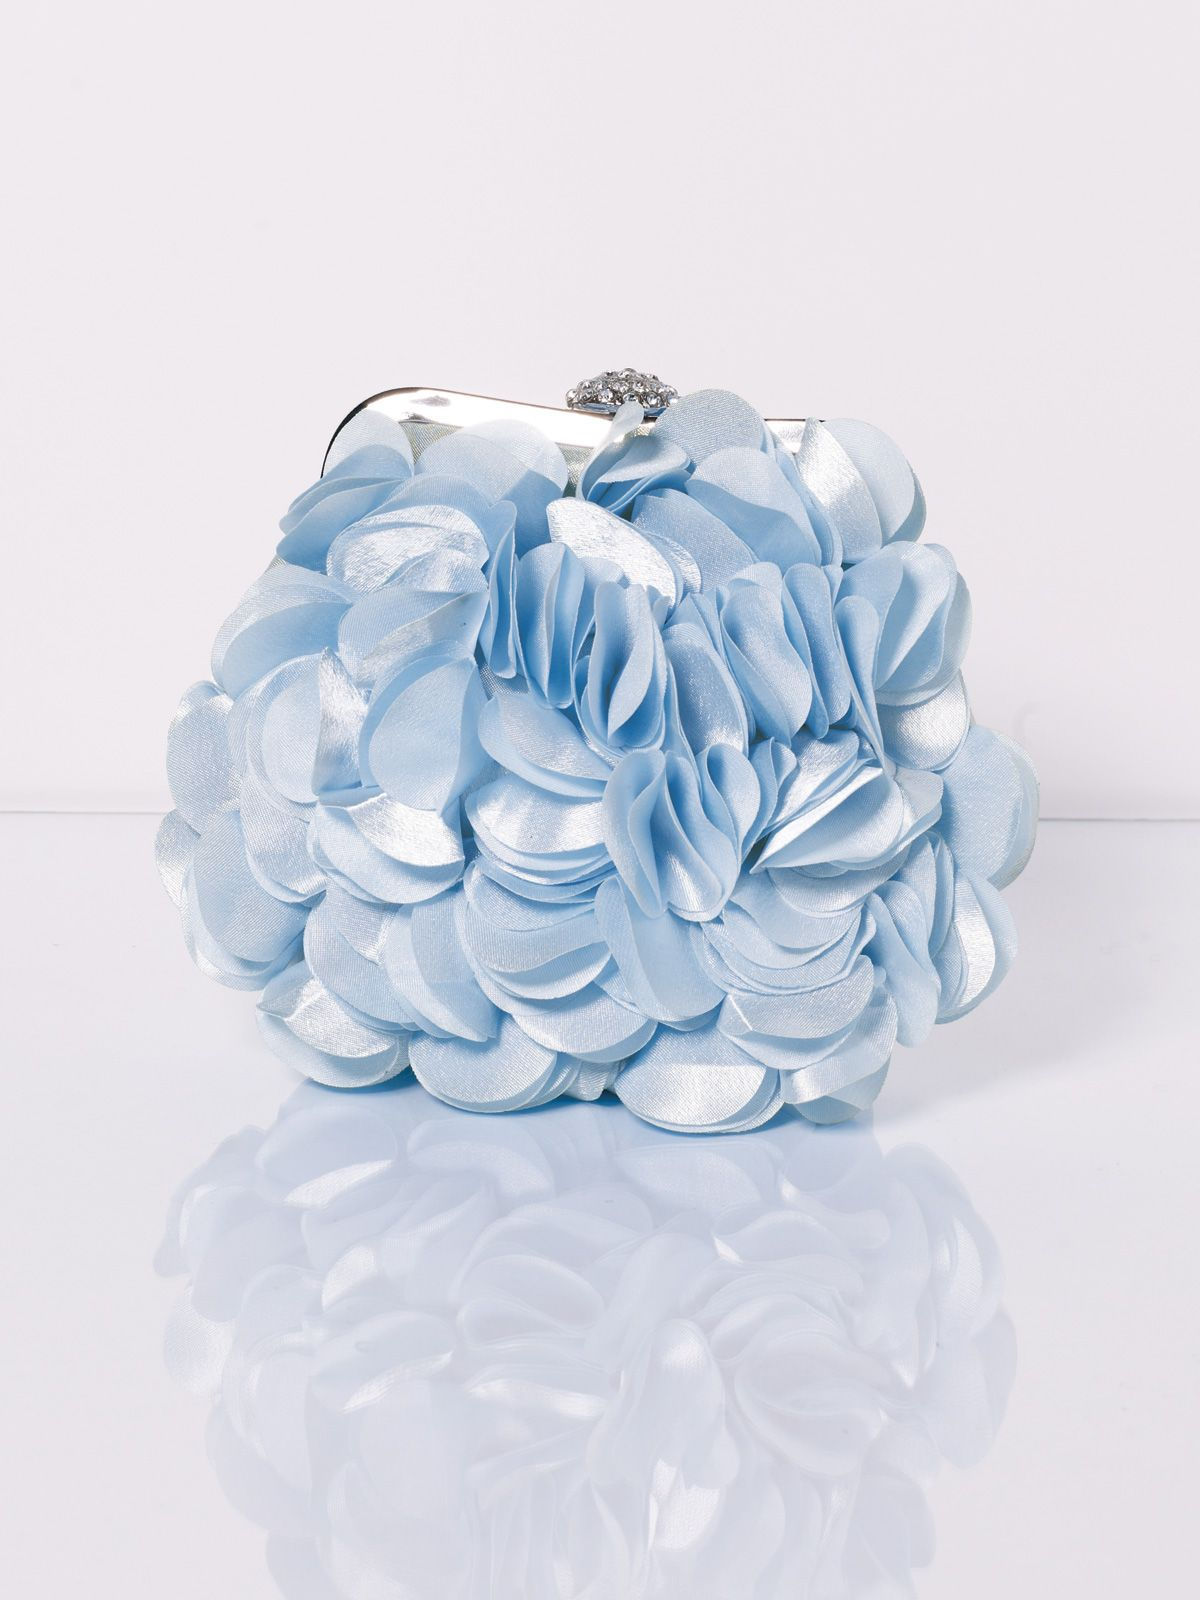 Wedding clutch handbag with allover petal-like accents, tab frame ...